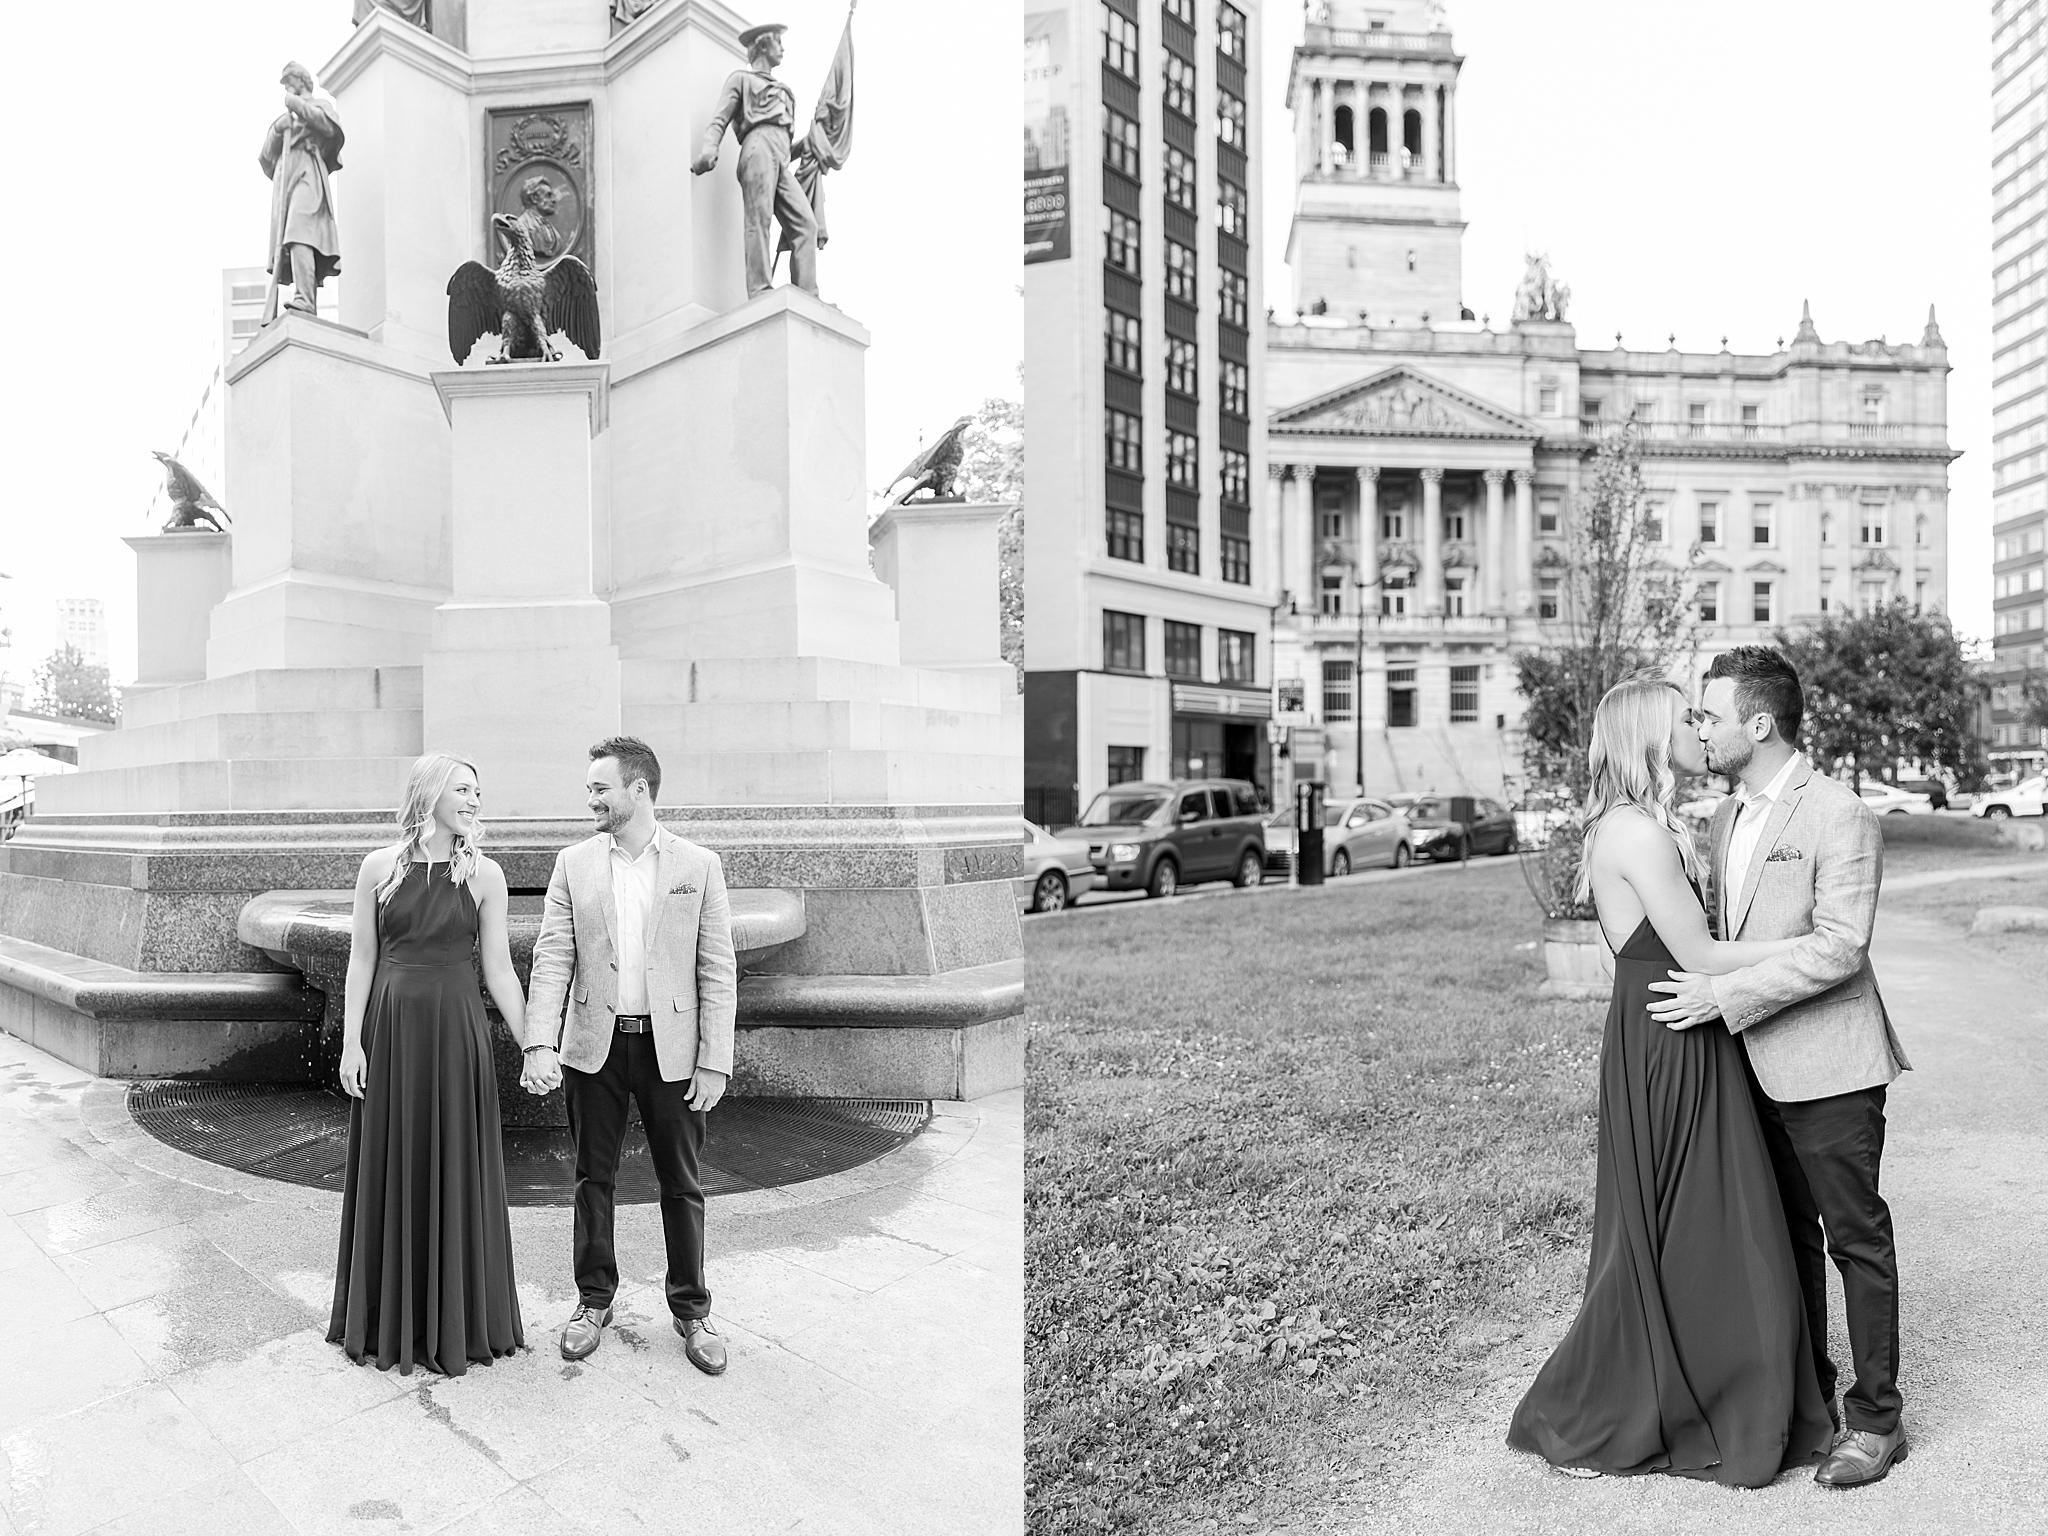 detroit-wedding-photographer-downtown-detroit-belle-isle-engagement-photos-sarah-eric-by-courtney-carolyn-photography_0023.jpg